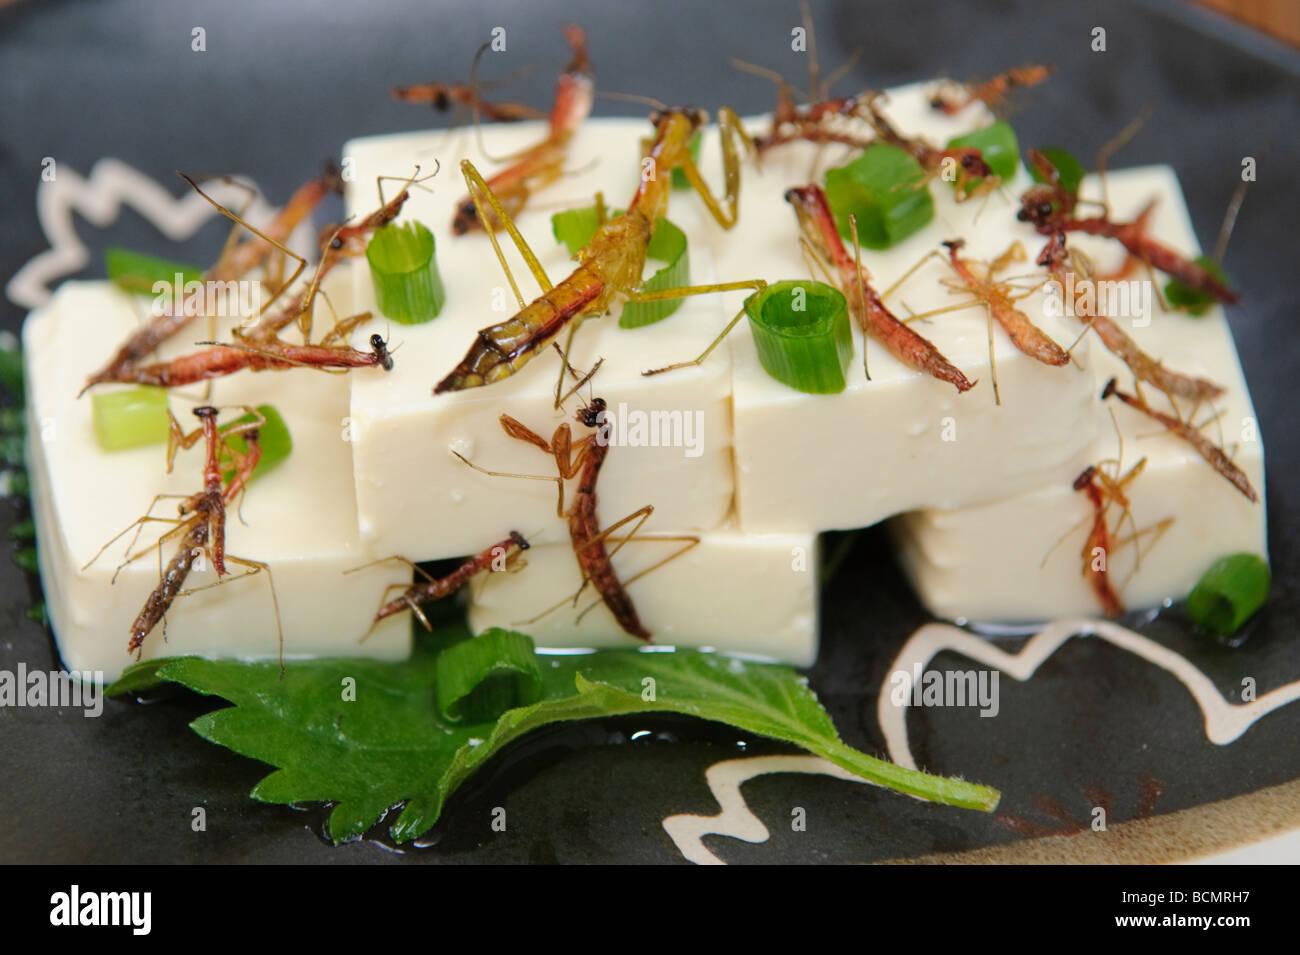 Preying mantis tofu, Tokyo, Japan, 28 October, 2008. - Stock Image